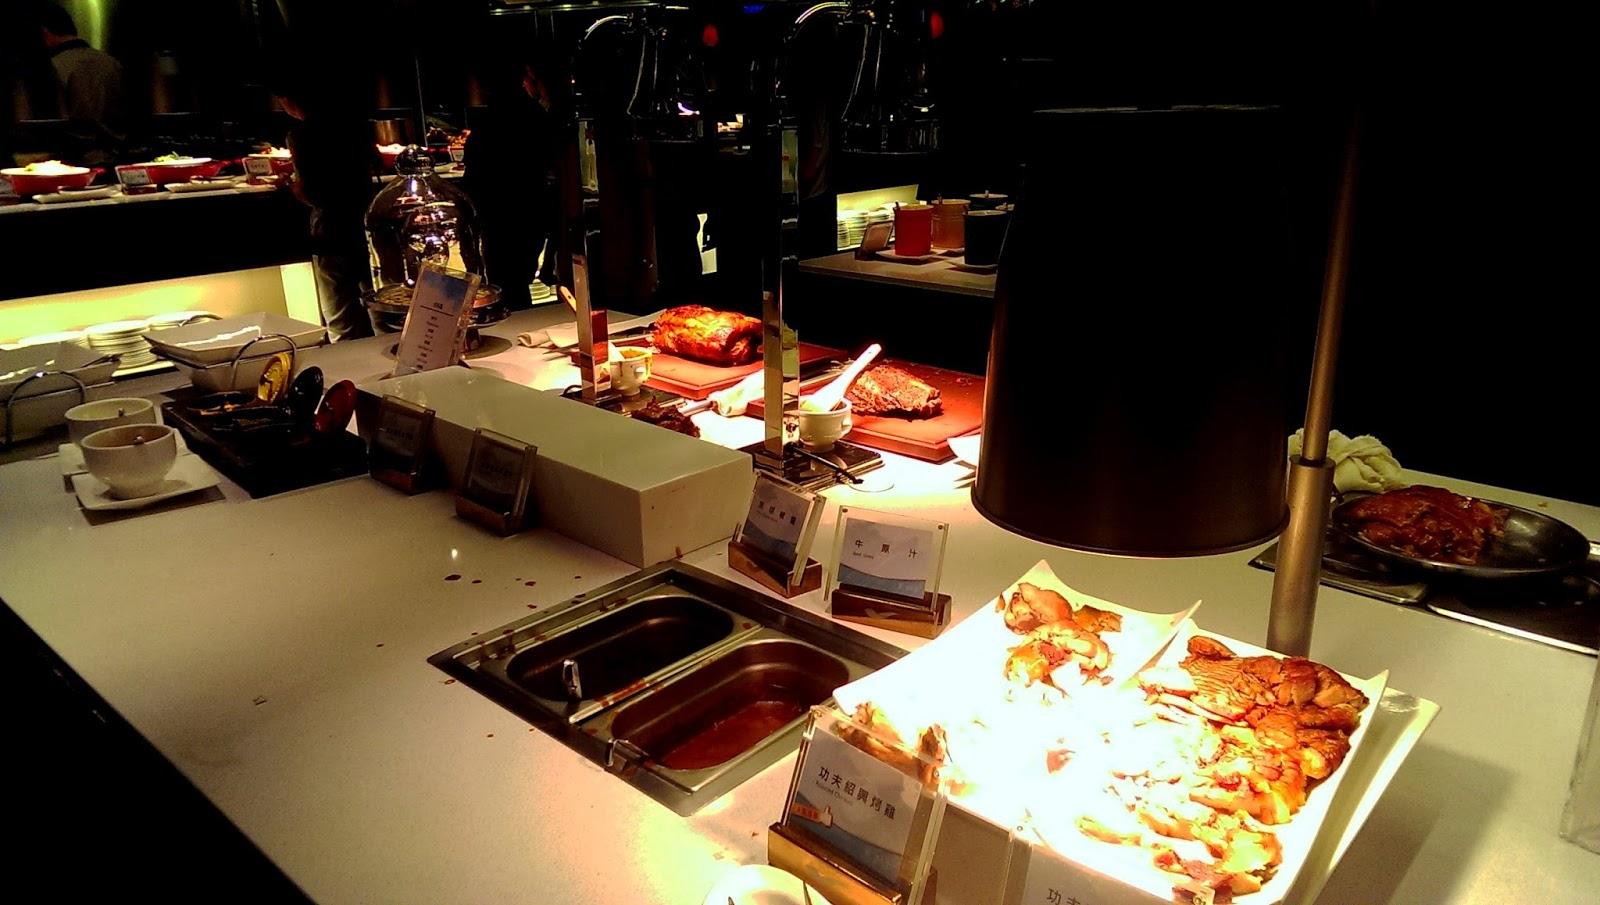 2015 07 01%2B19.11.28 - [食記] 台北京站 - 饗食天堂,有生魚片吃到飽的高級自助餐廳!